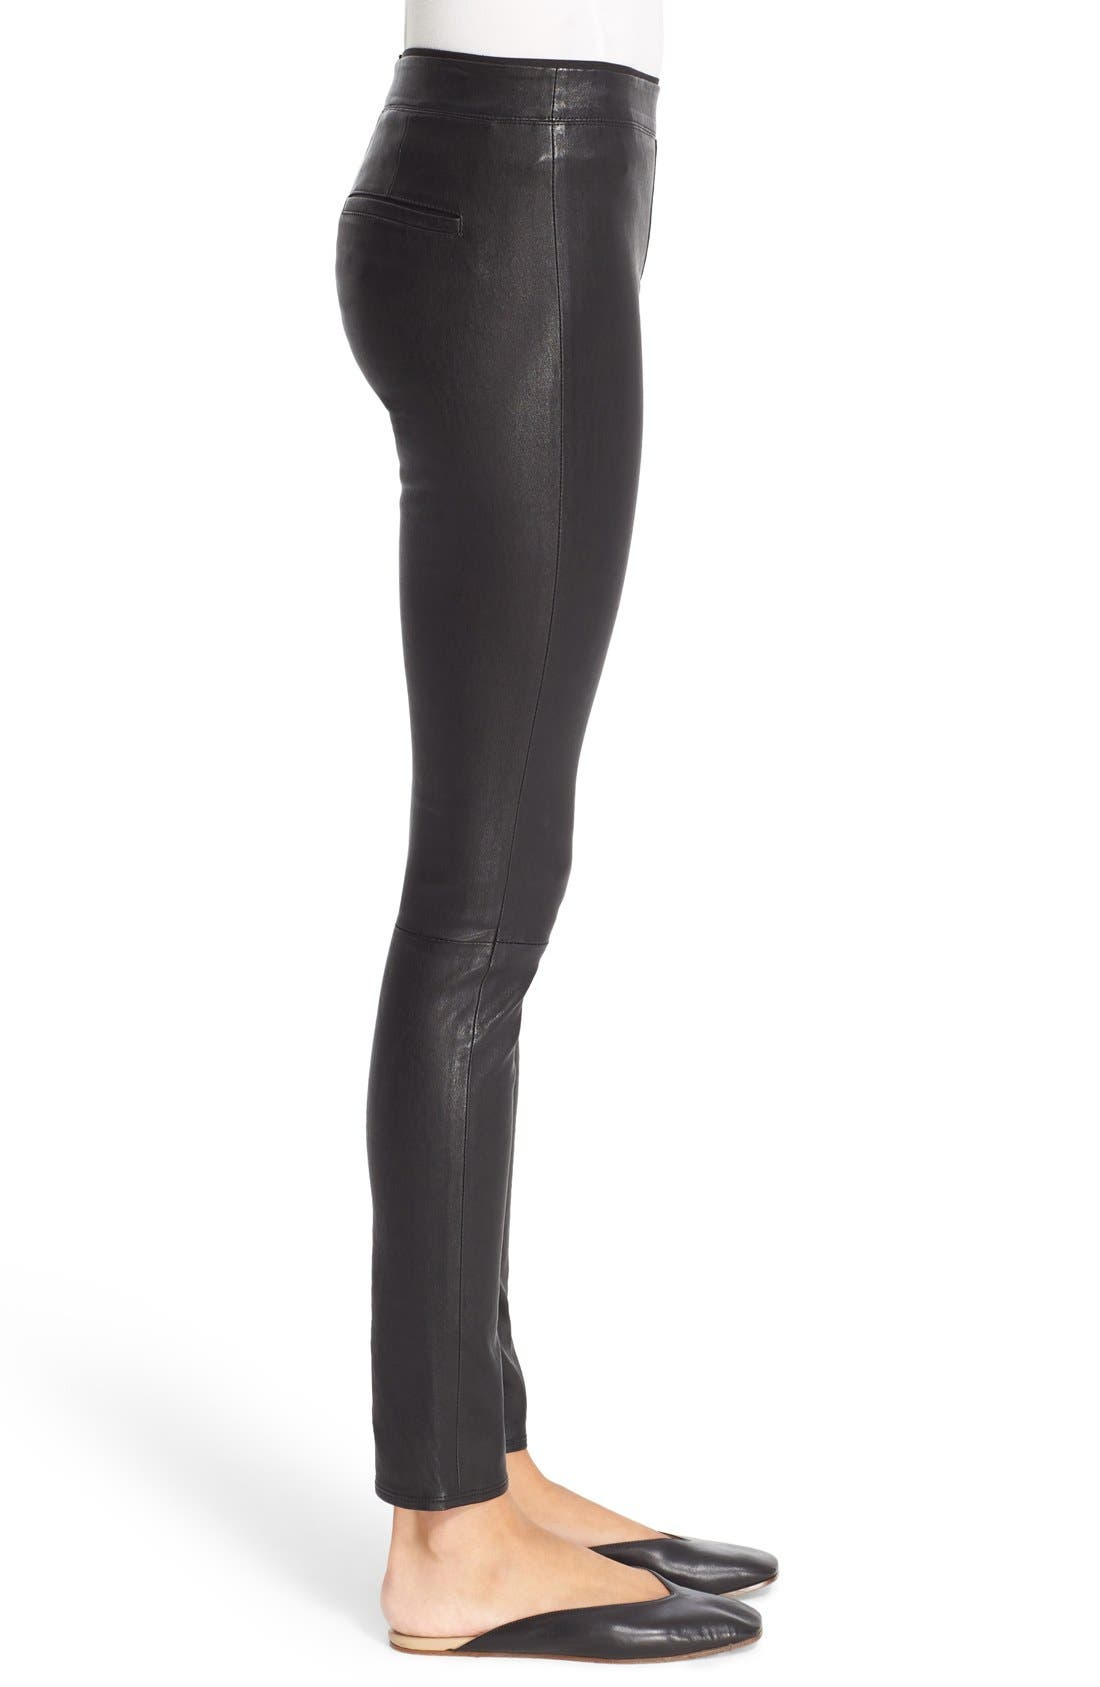 HELMUT LANG, Stretch Lambskin Leather Leggings, Alternate thumbnail 11, color, BLACK